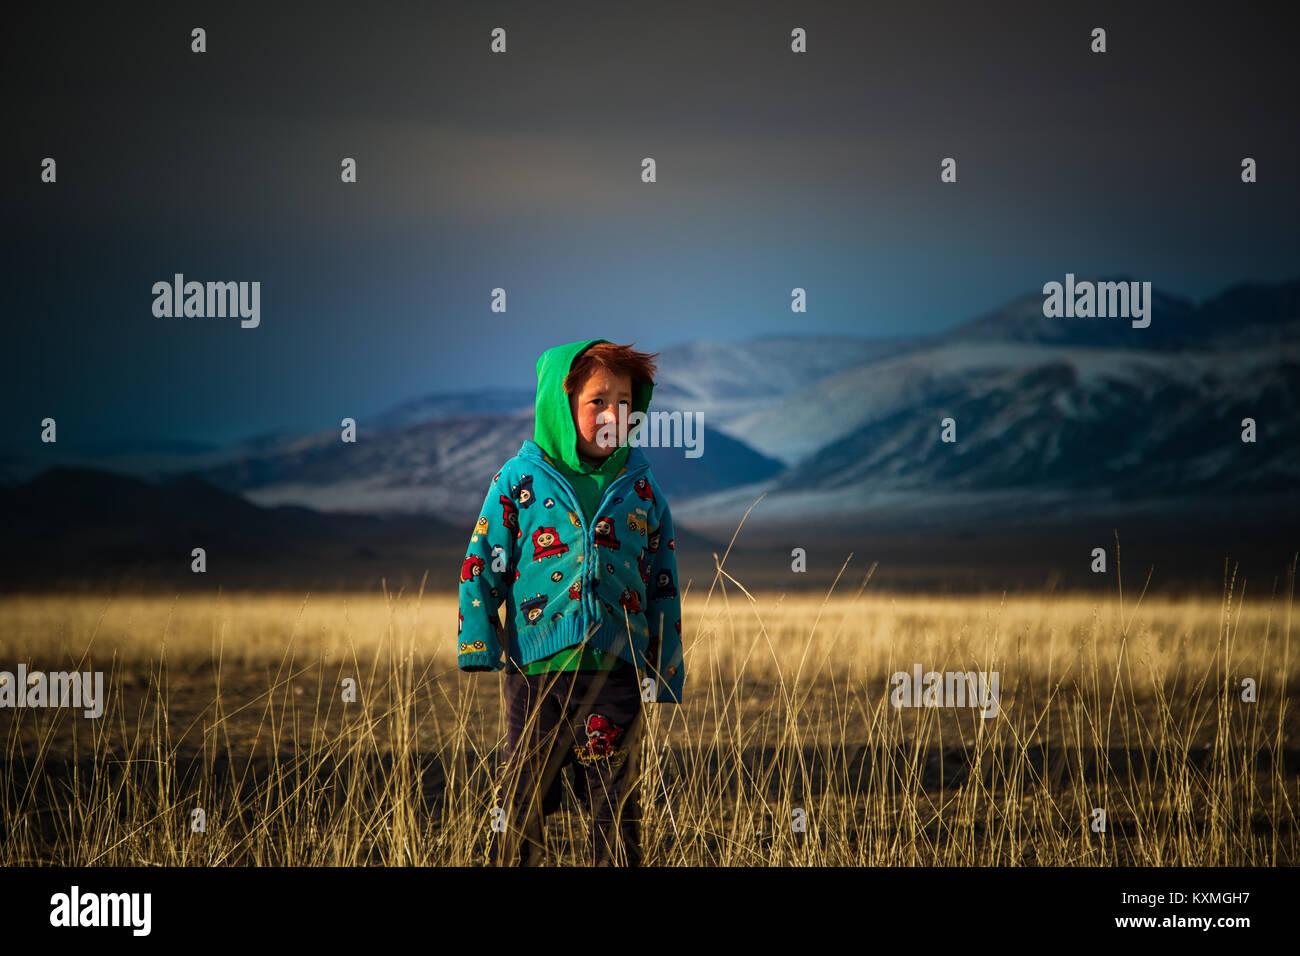 Country side rural kid ginger hair Mongolia steppes grasslands winter - Stock Image